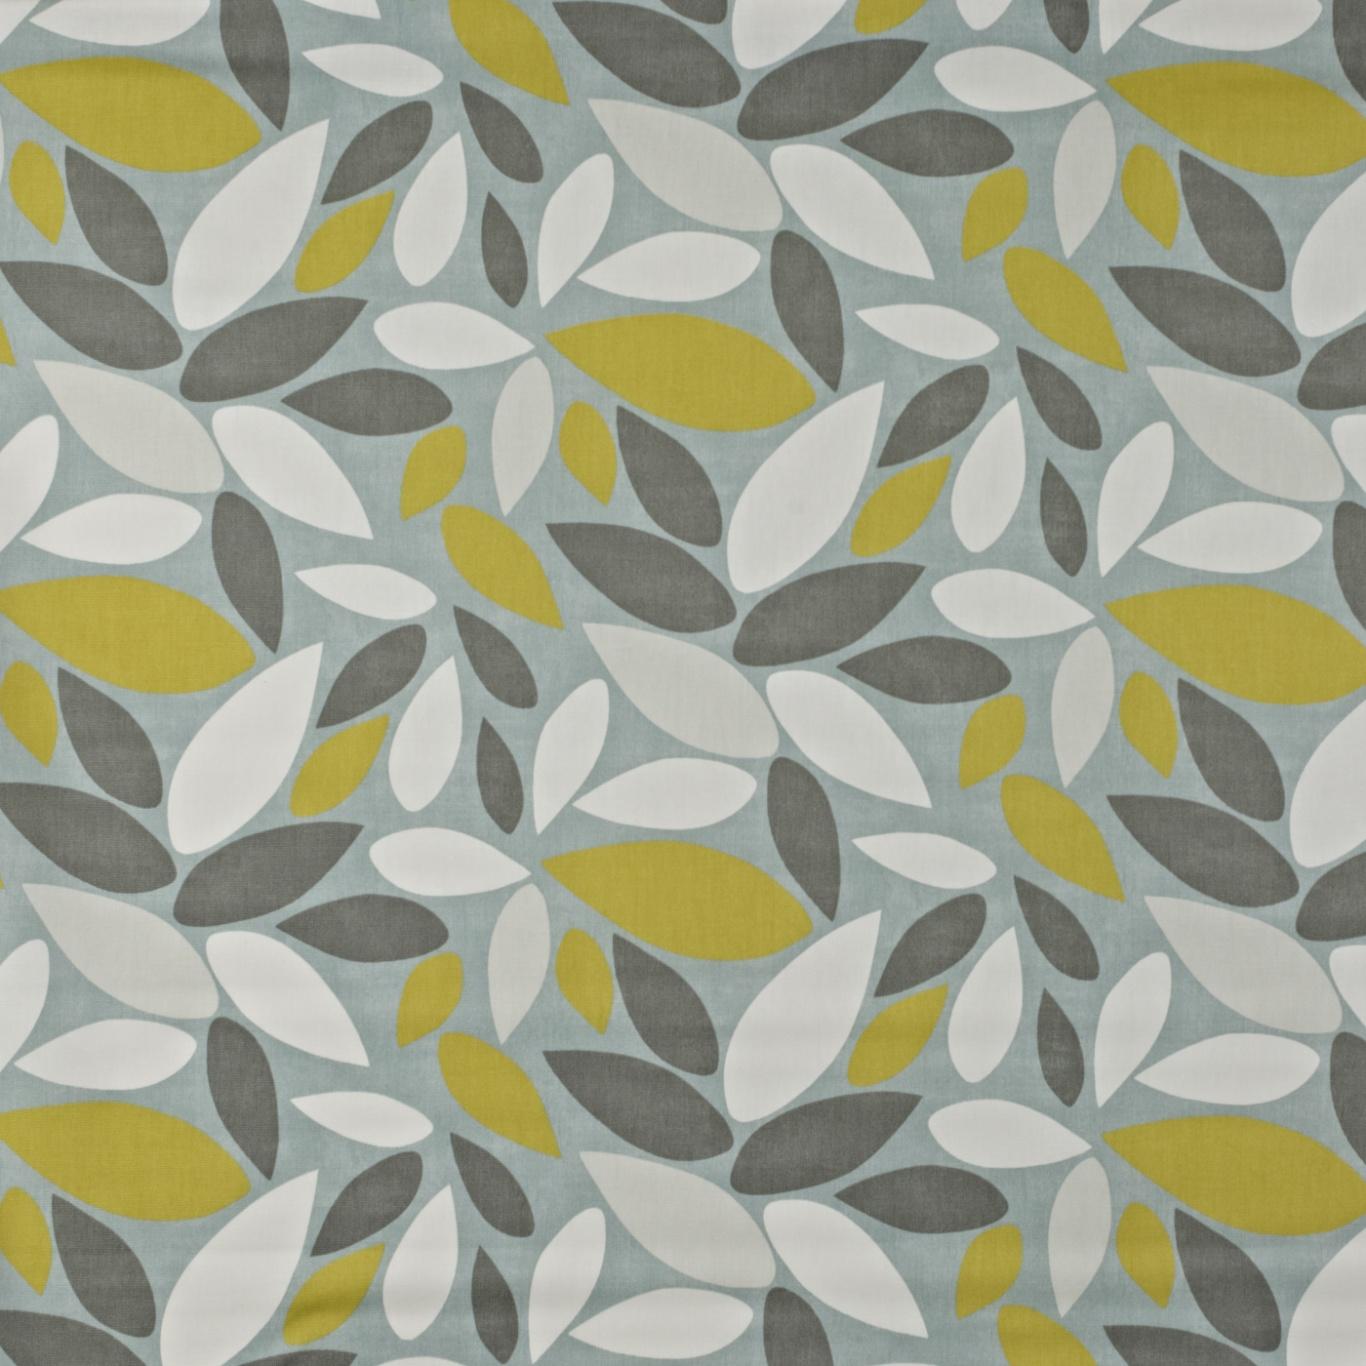 Image of Prestigious Pimlico Duck Egg Curtain Fabric